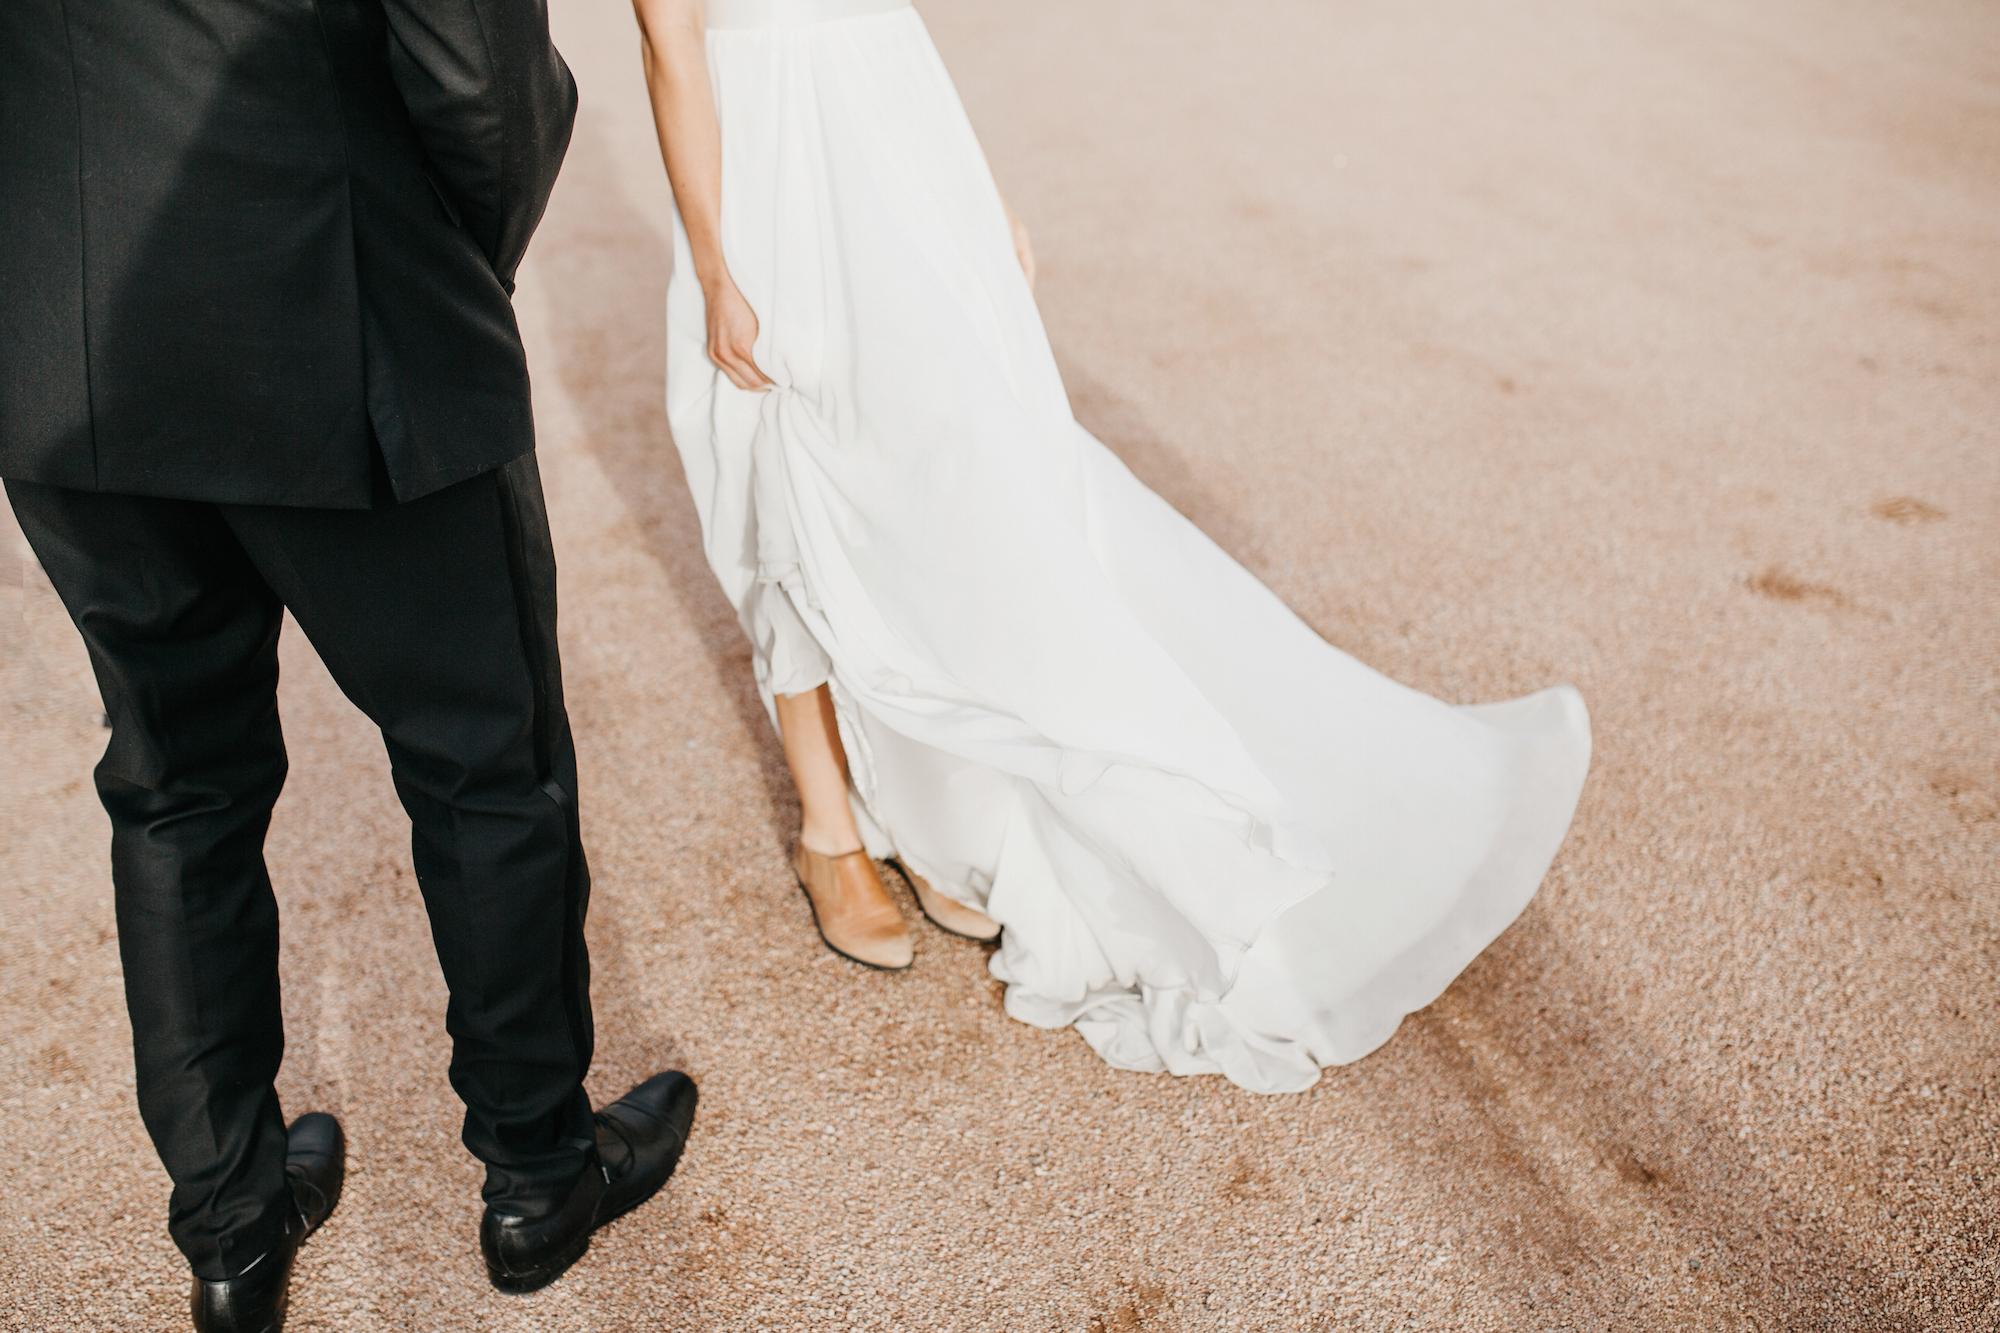 arizona - wedding - photographer698.jpg